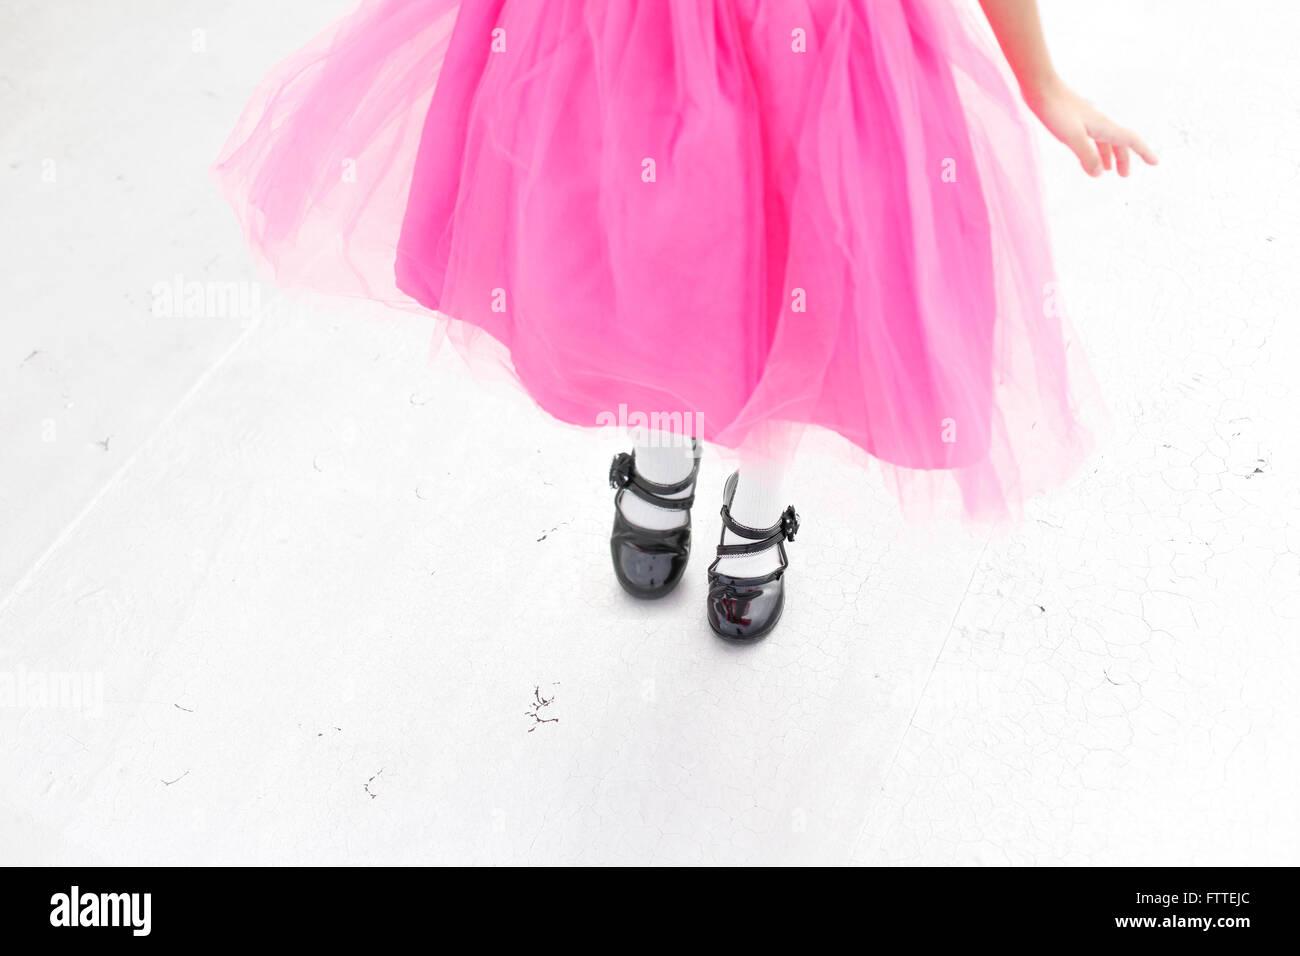 Fille asiatique en robe rose Photo Stock